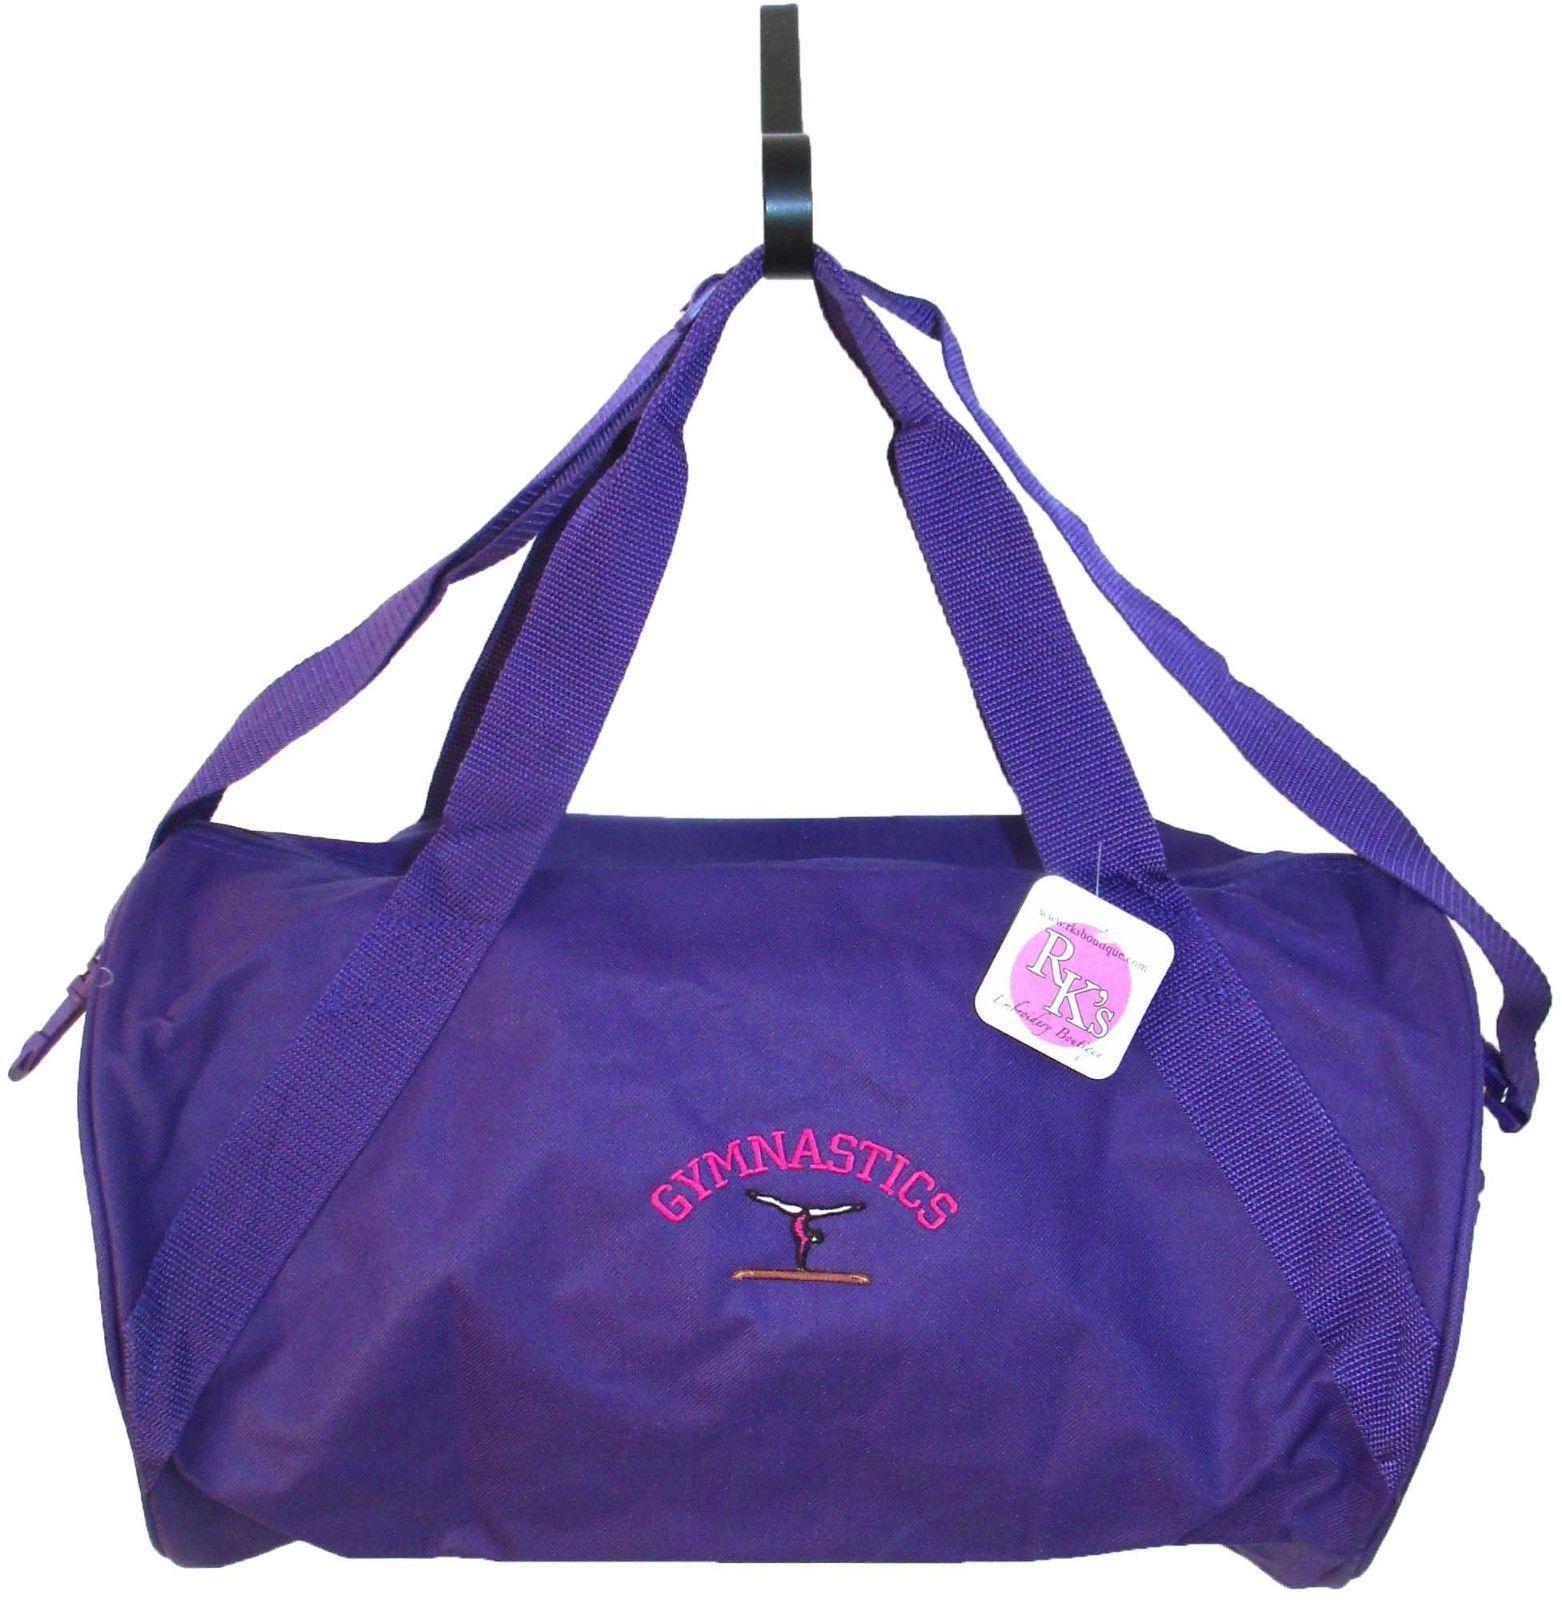 Free gym bag giveaways